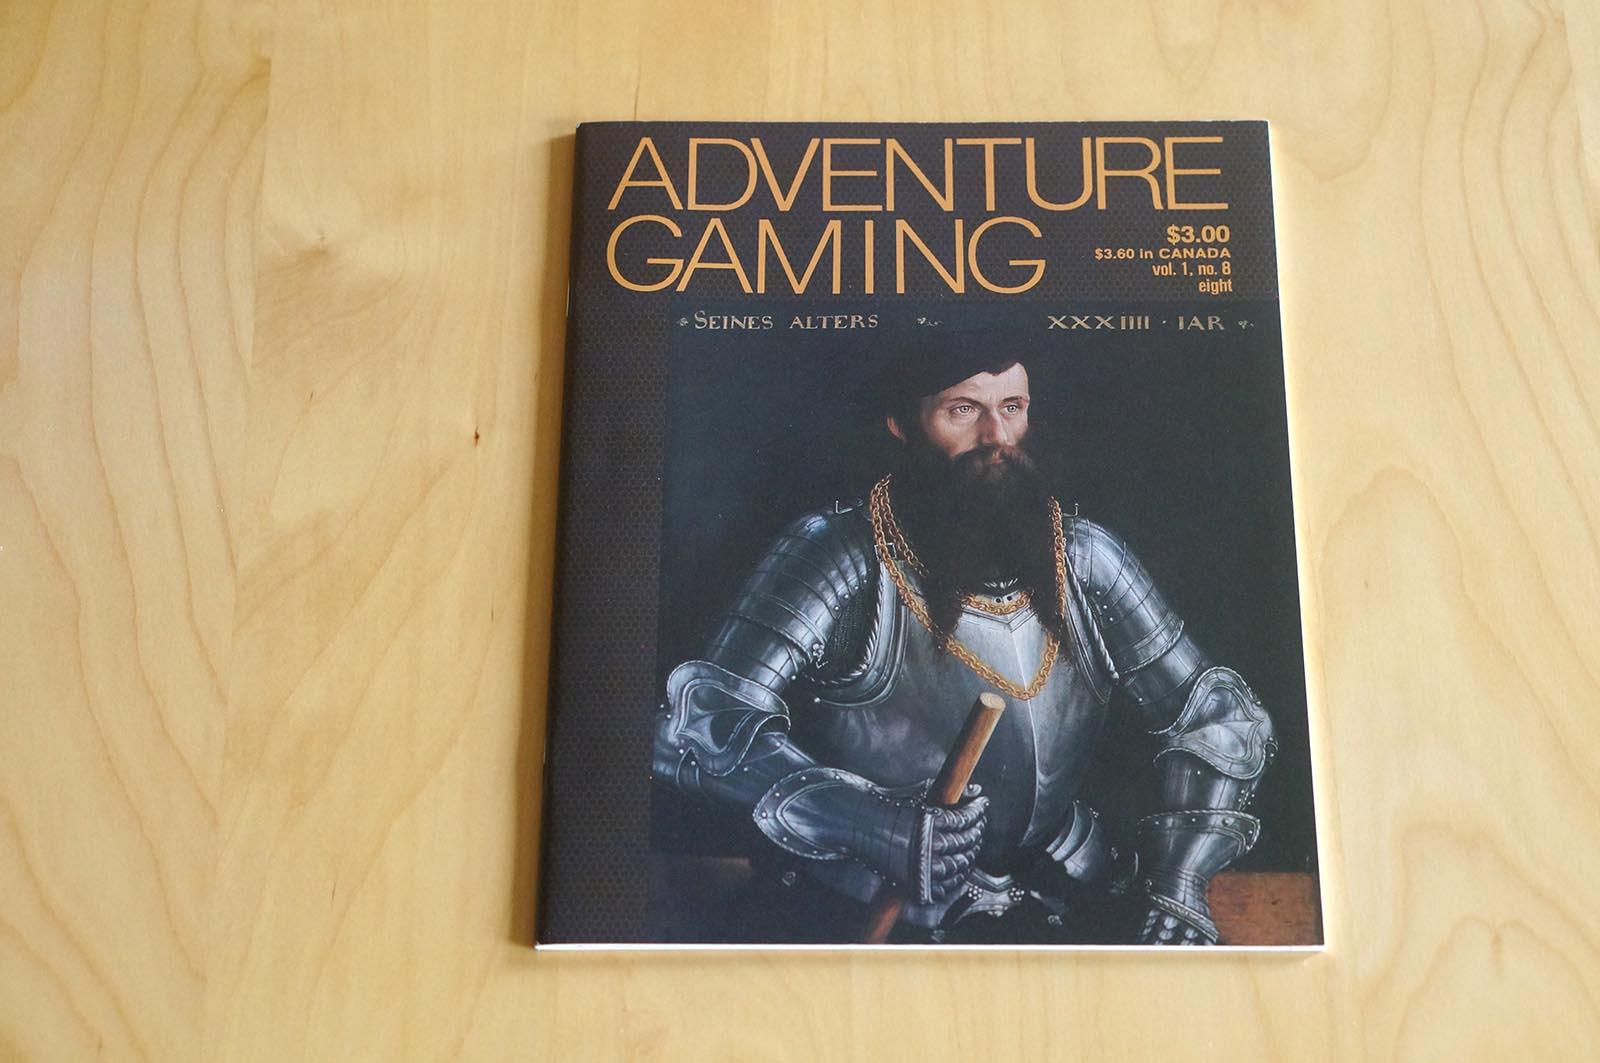 Adventure Gaming Newsletter 1981